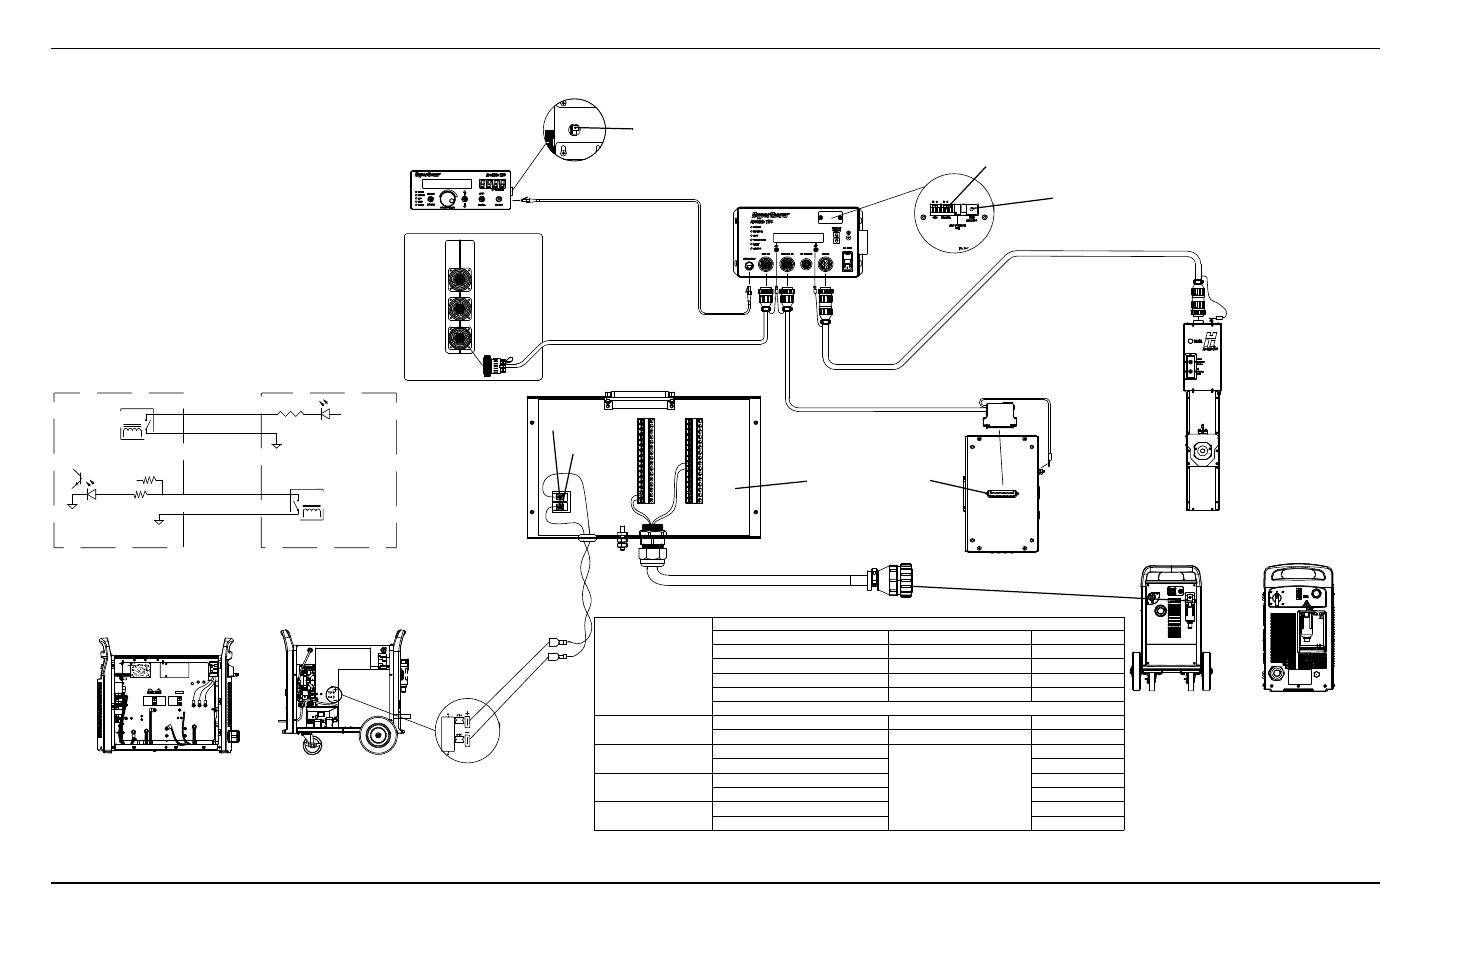 Hypertherm Powermax Wiring Diagram